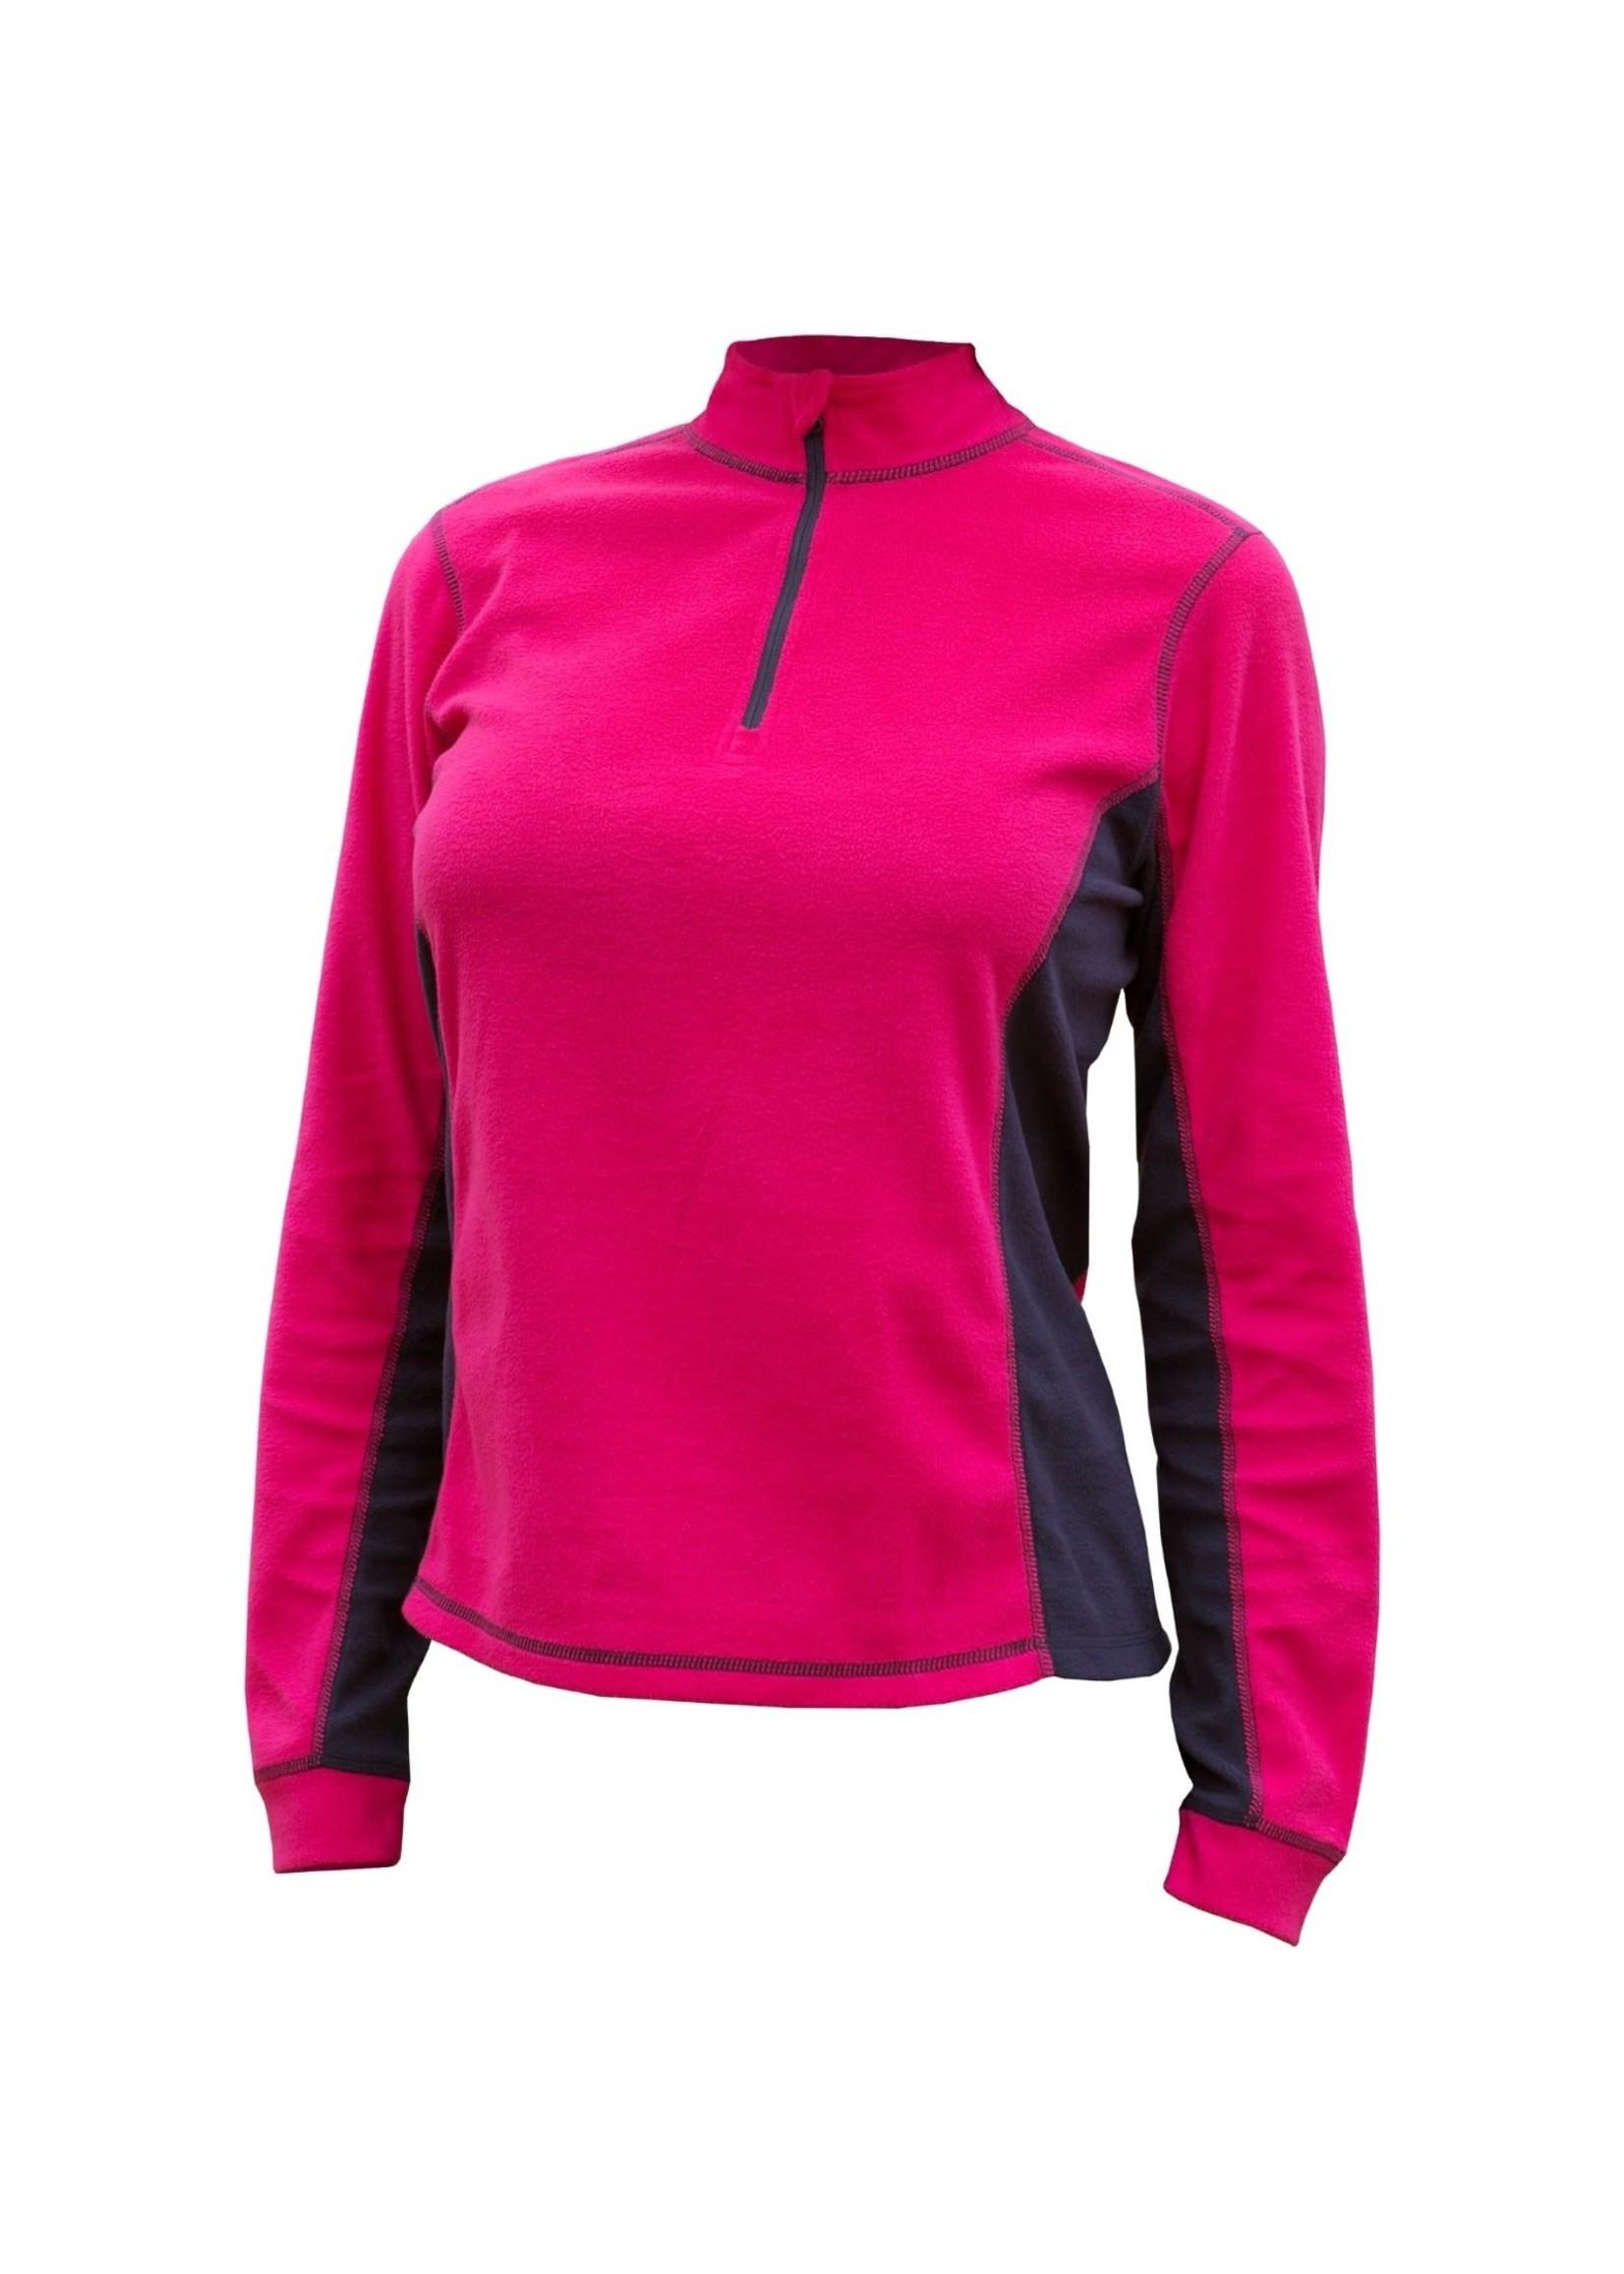 Catmandoo Sania Ladies 1/4 Zip Microfleece Midlayer, Pink/Navy